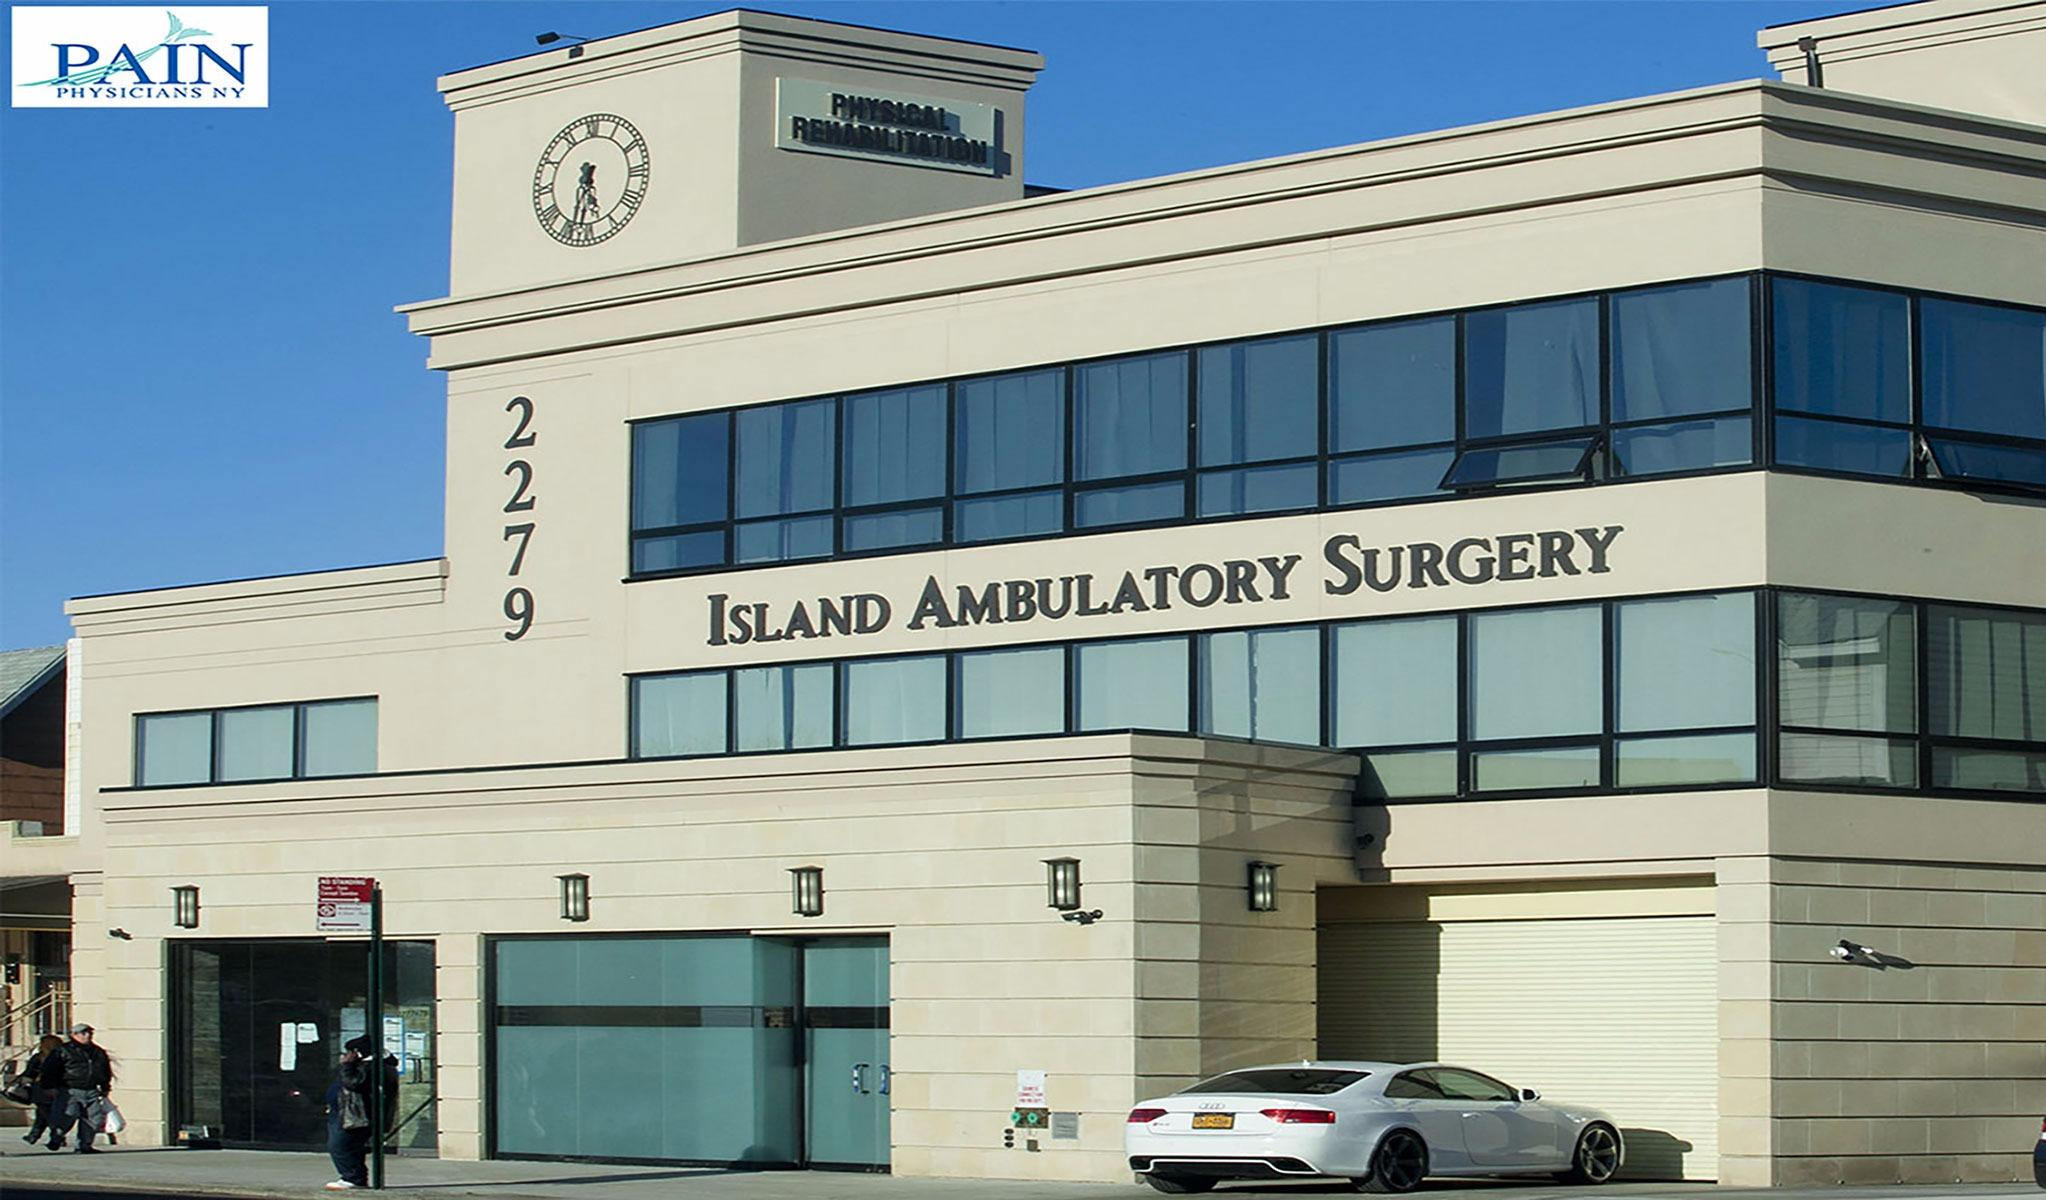 pain physicians ny 2279 coney island ave brooklyn ny. Black Bedroom Furniture Sets. Home Design Ideas